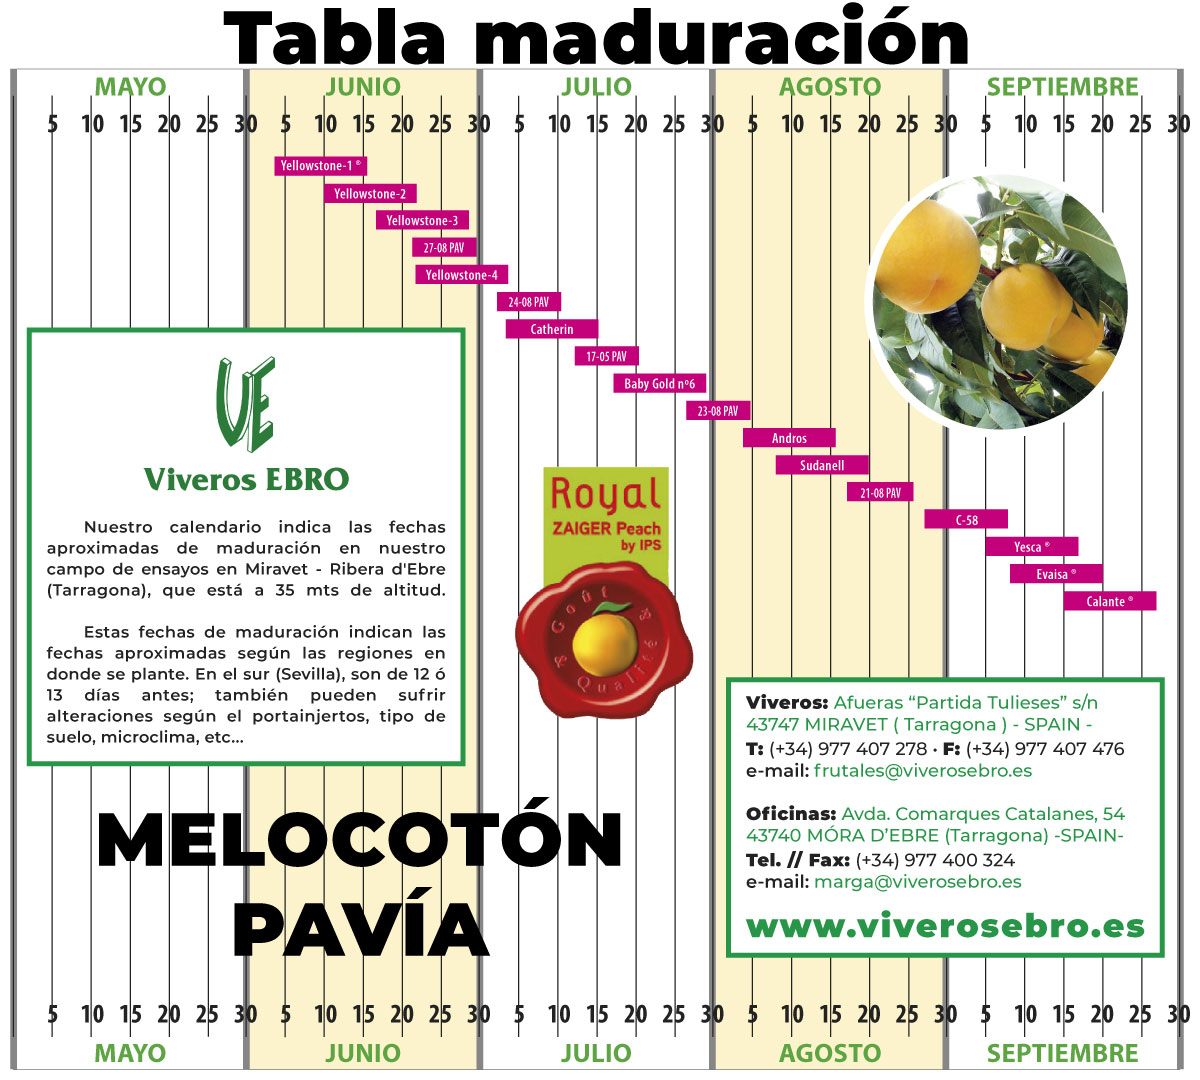 Cuadro Maduracion Melocoton PAVIA 2021